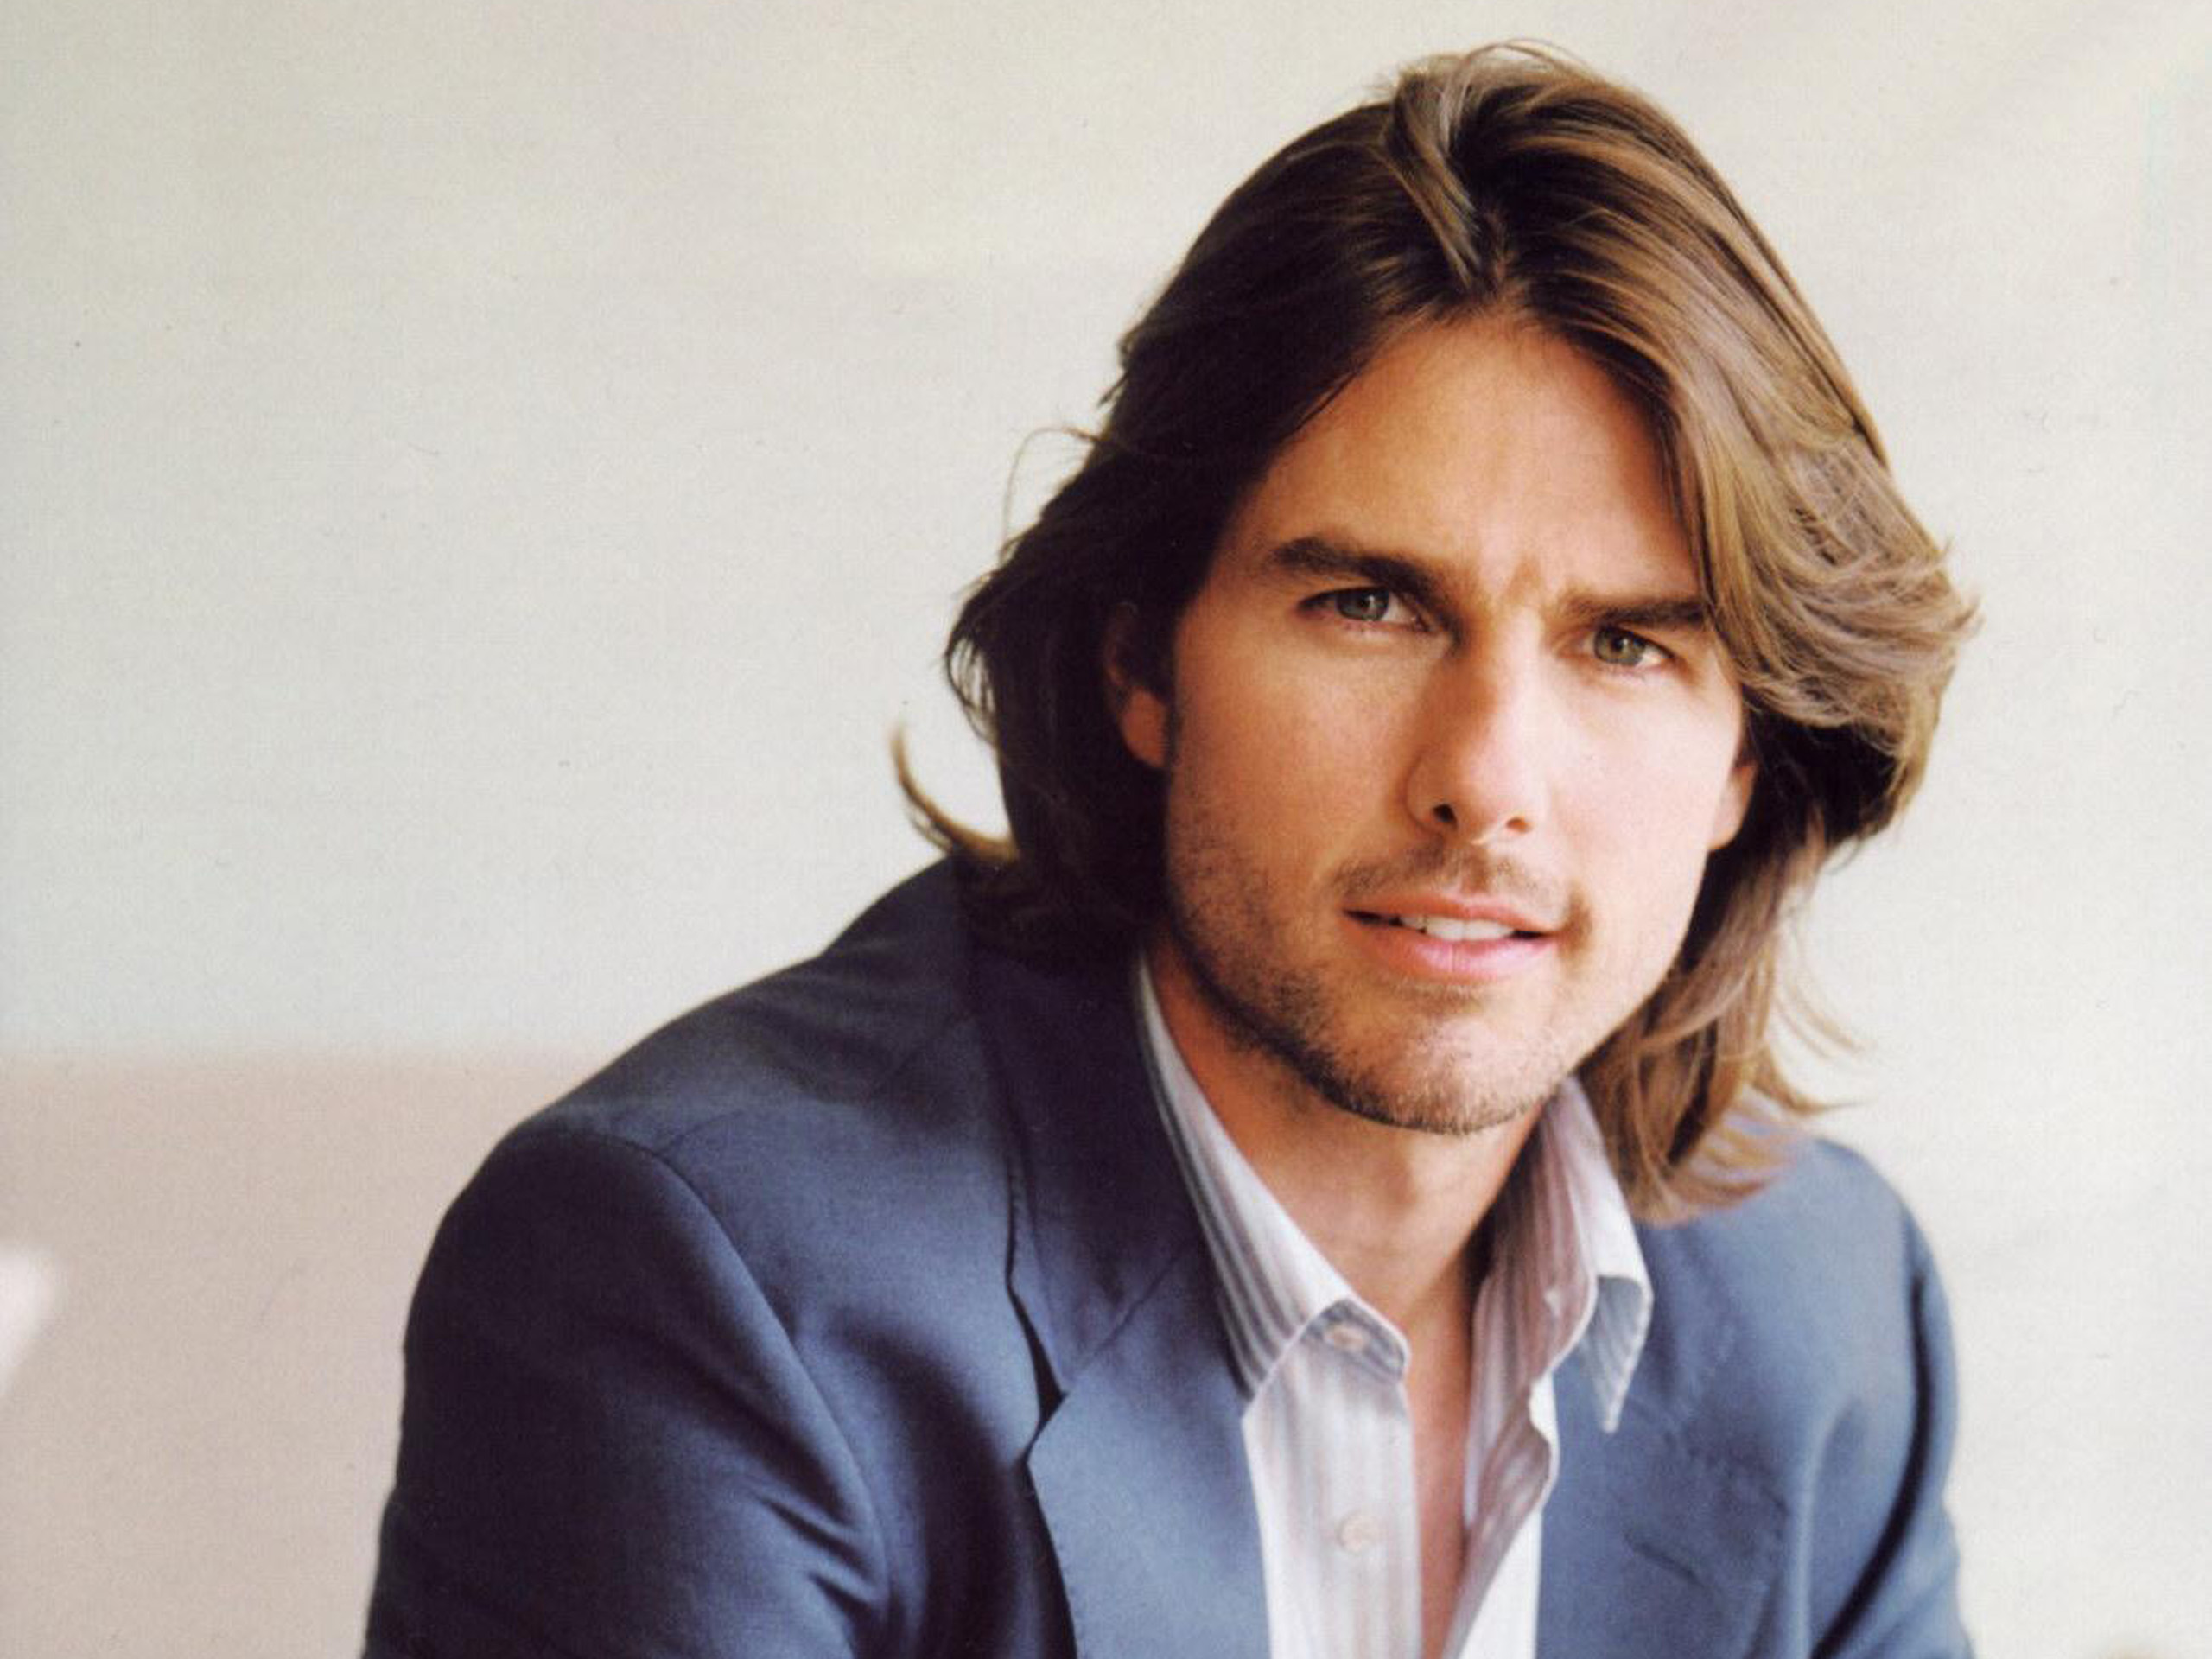 TOm Cruise   Tom Cruise Wallpaper 24203277 2560x1920